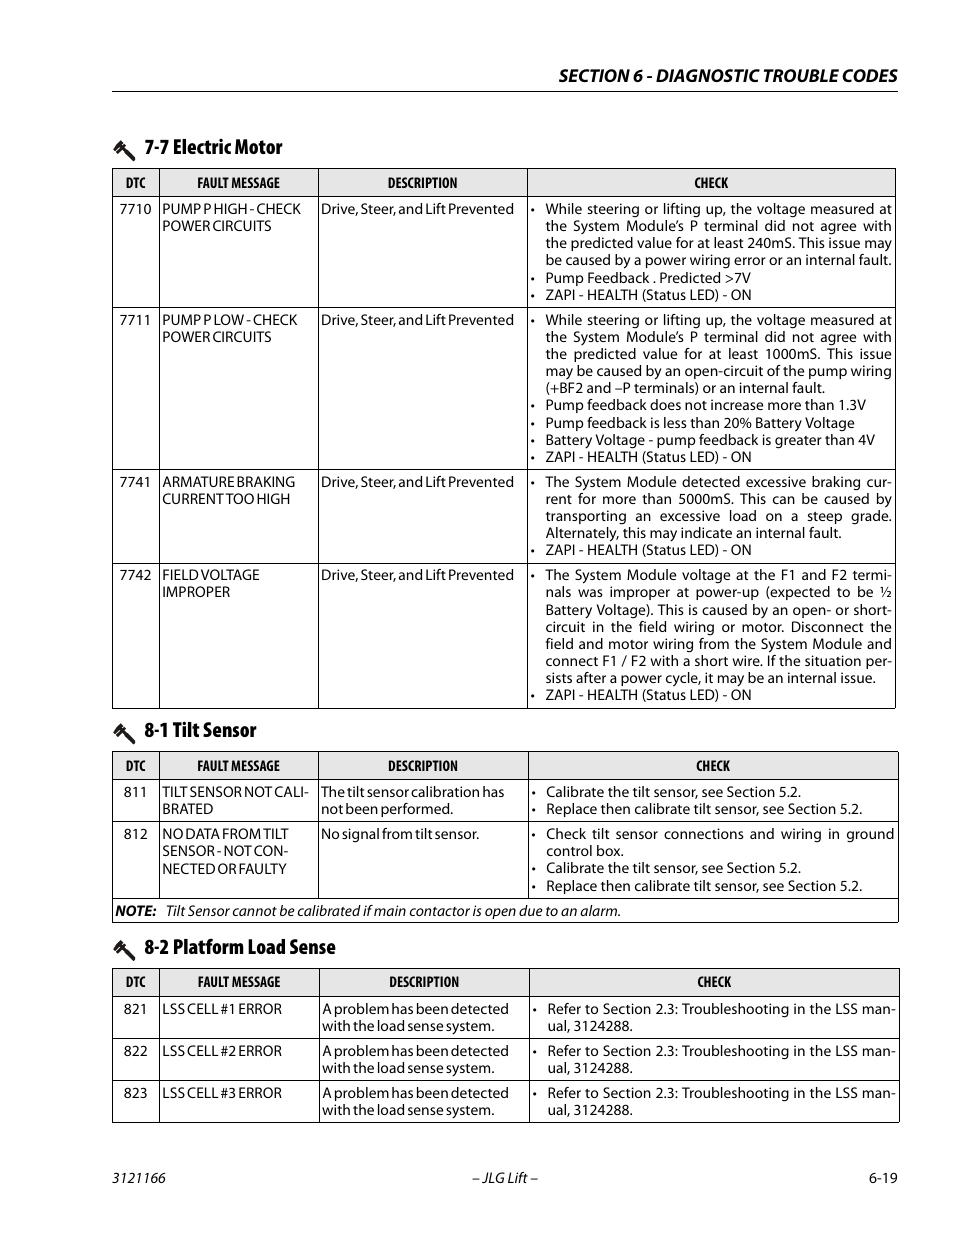 jlg 3246es service manual page171?resize\\\\\\\\\\\\\\\=665%2C861 peterbilt tachometer wiring diagram peterbilt starter wiring 2000 peterbilt 379 tachometer wiring diagram at readyjetset.co